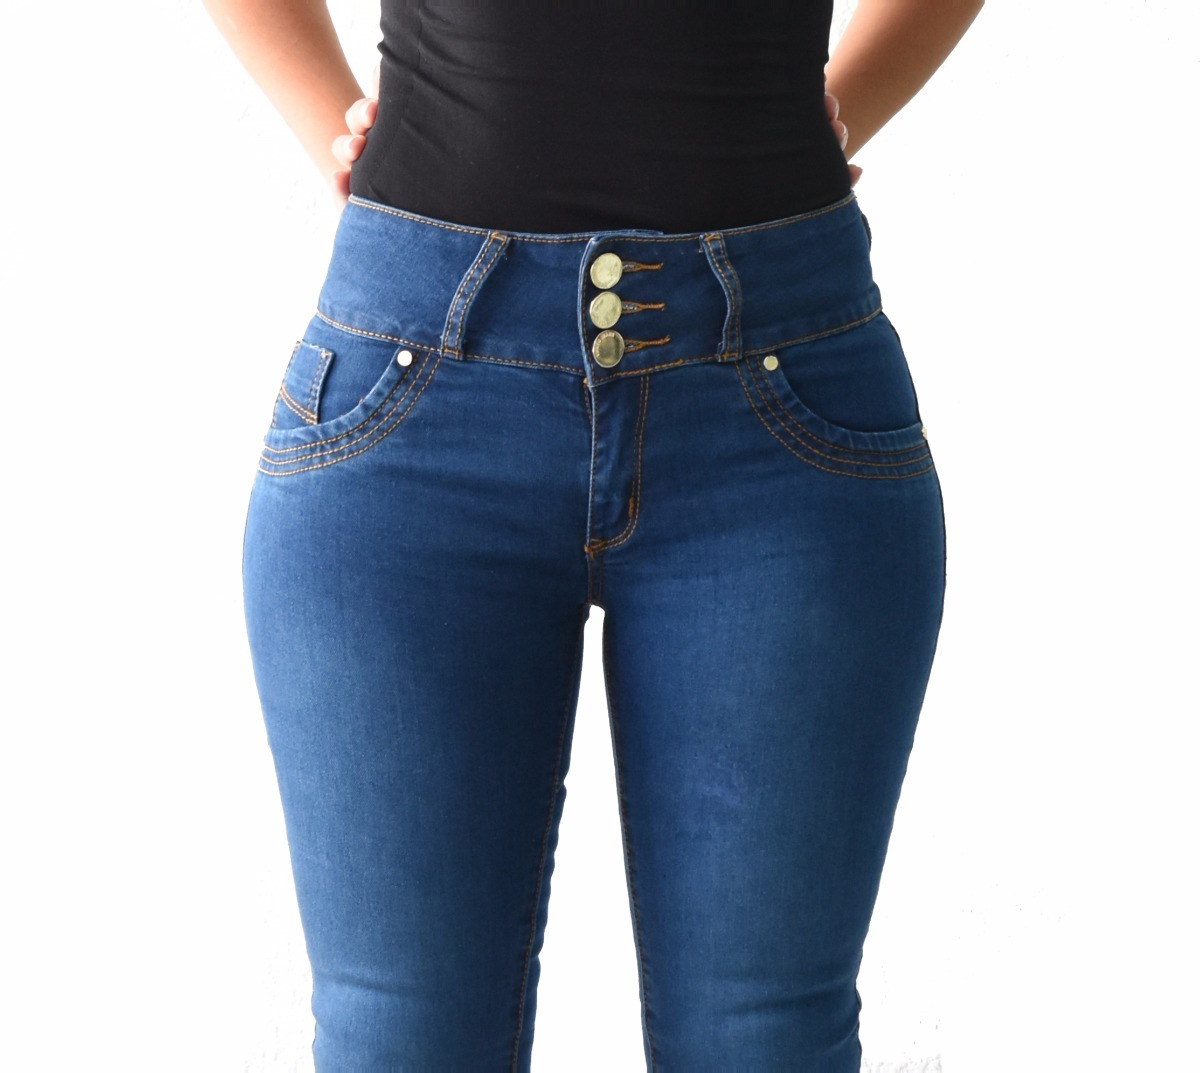 a7d9e036fb5 pantalones colombianos jeans dama mezclilla push up v-f36. Cargando zoom.